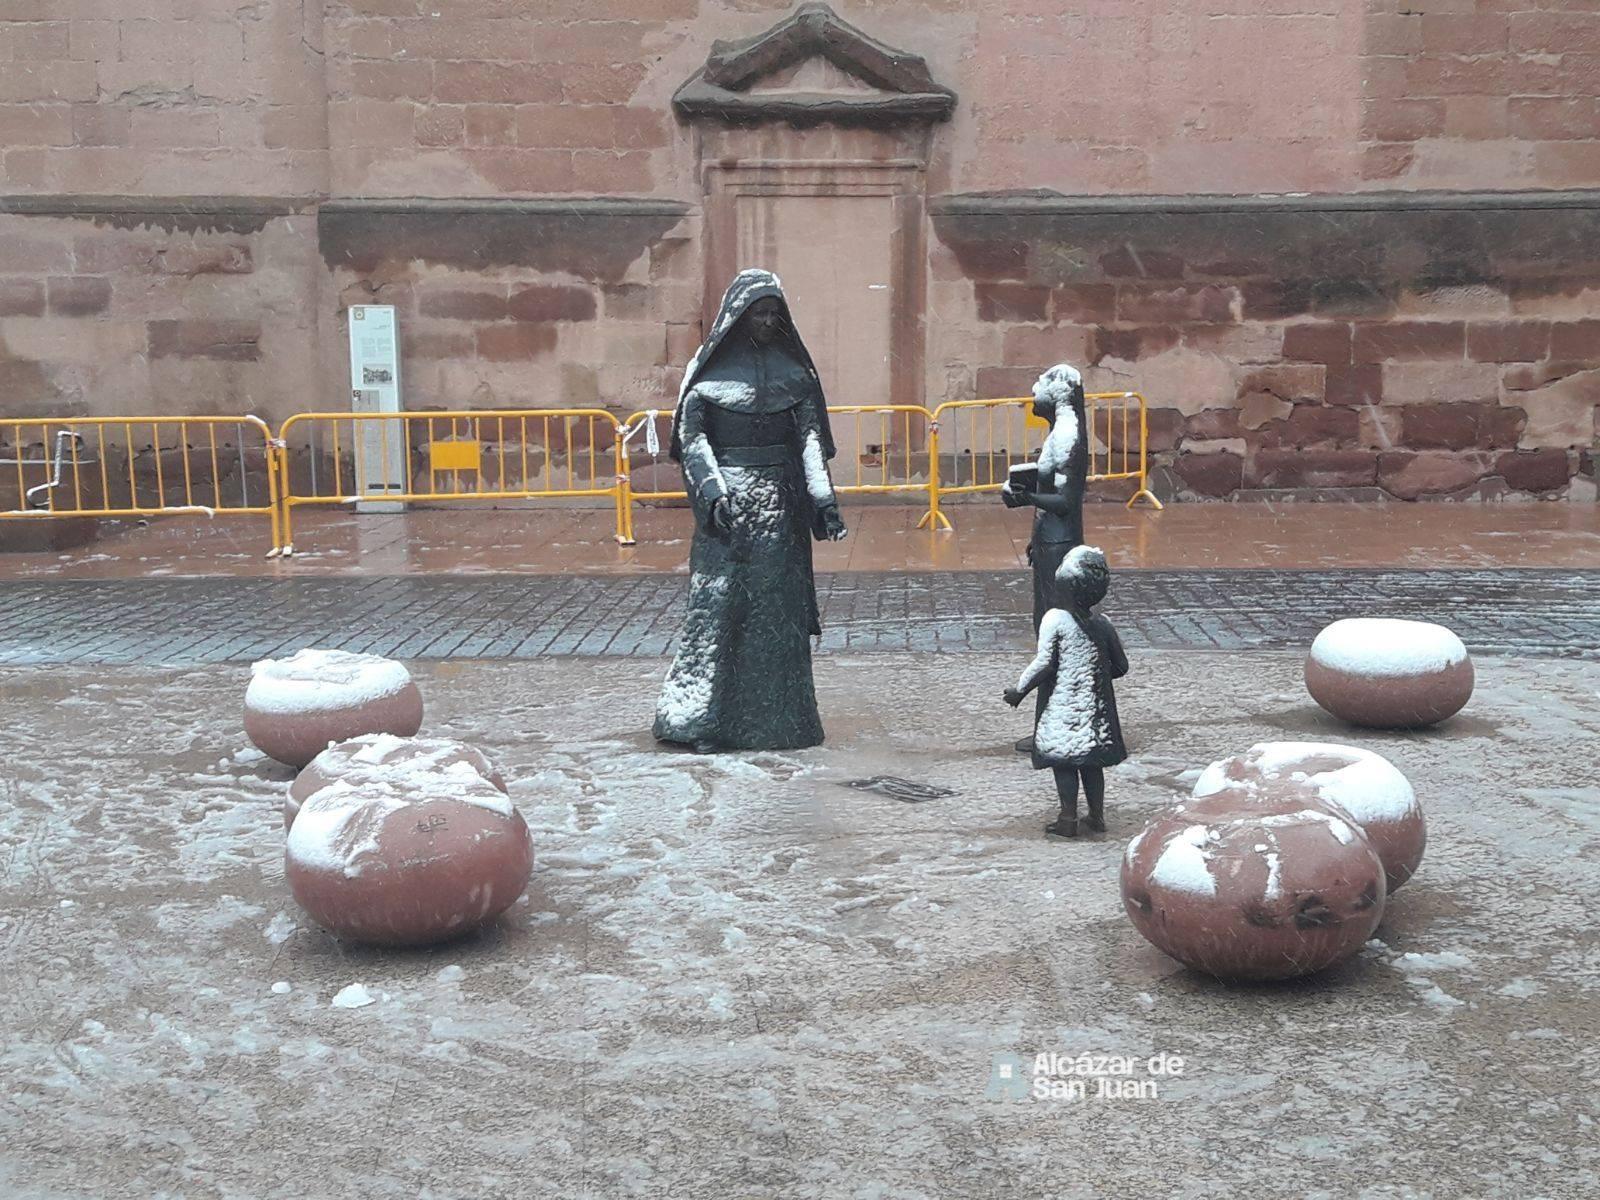 alcazar-calles-nieve-6 1